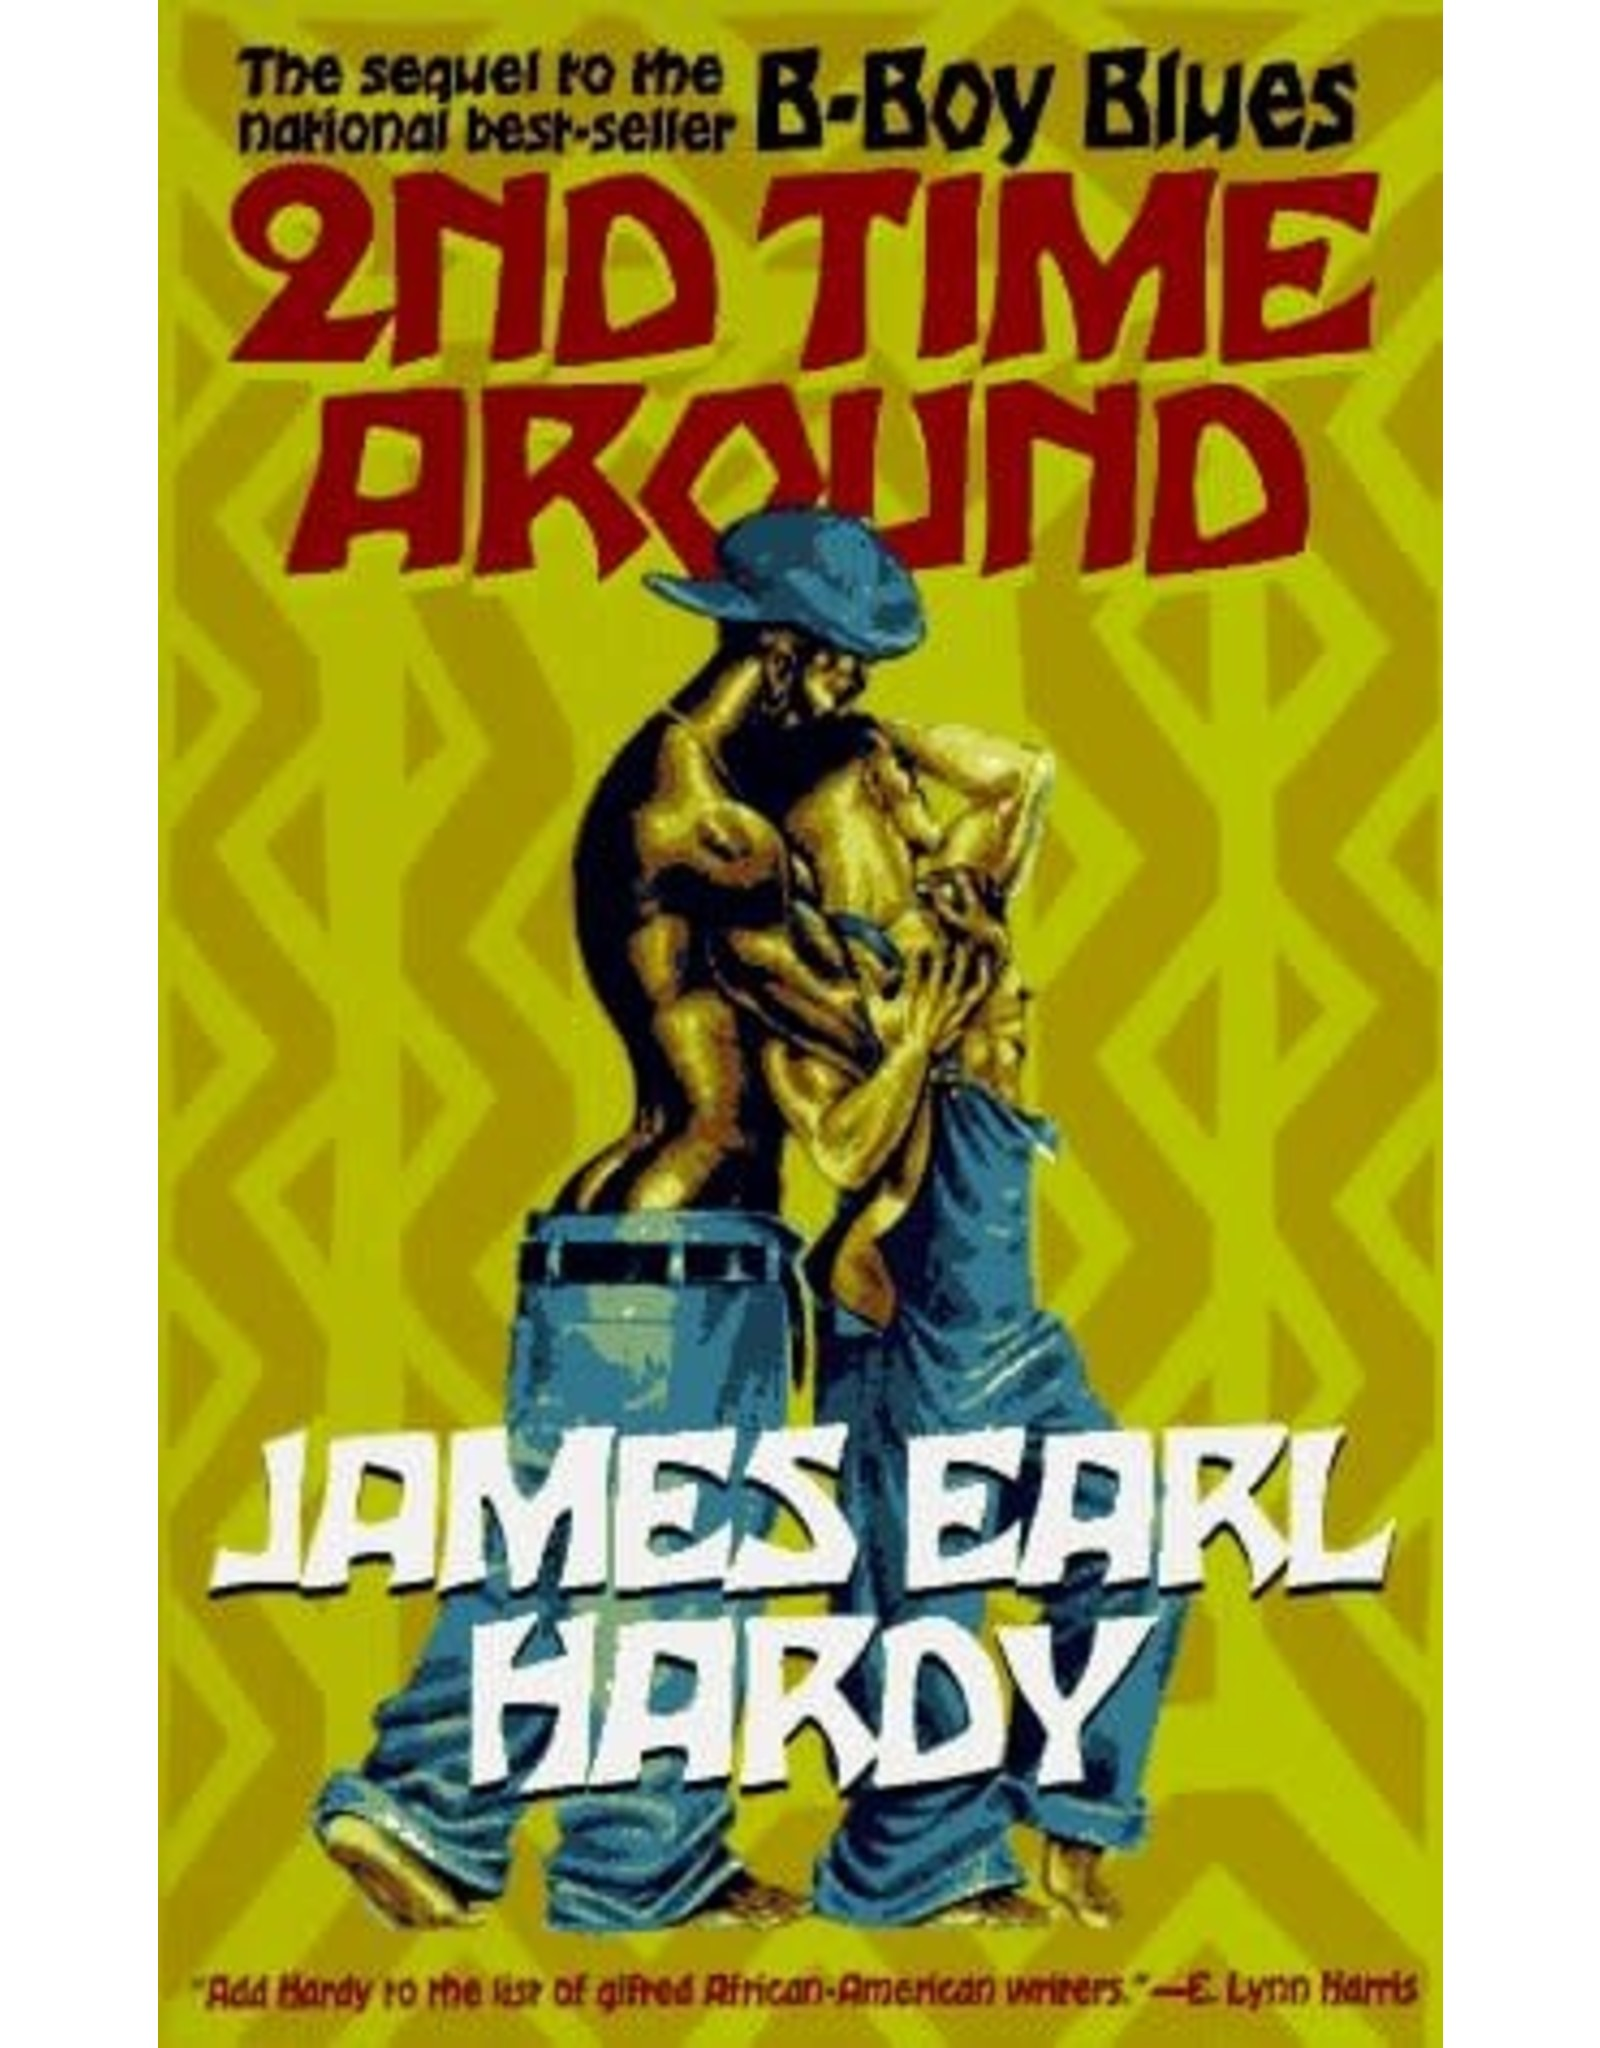 2ND TIME AROUND